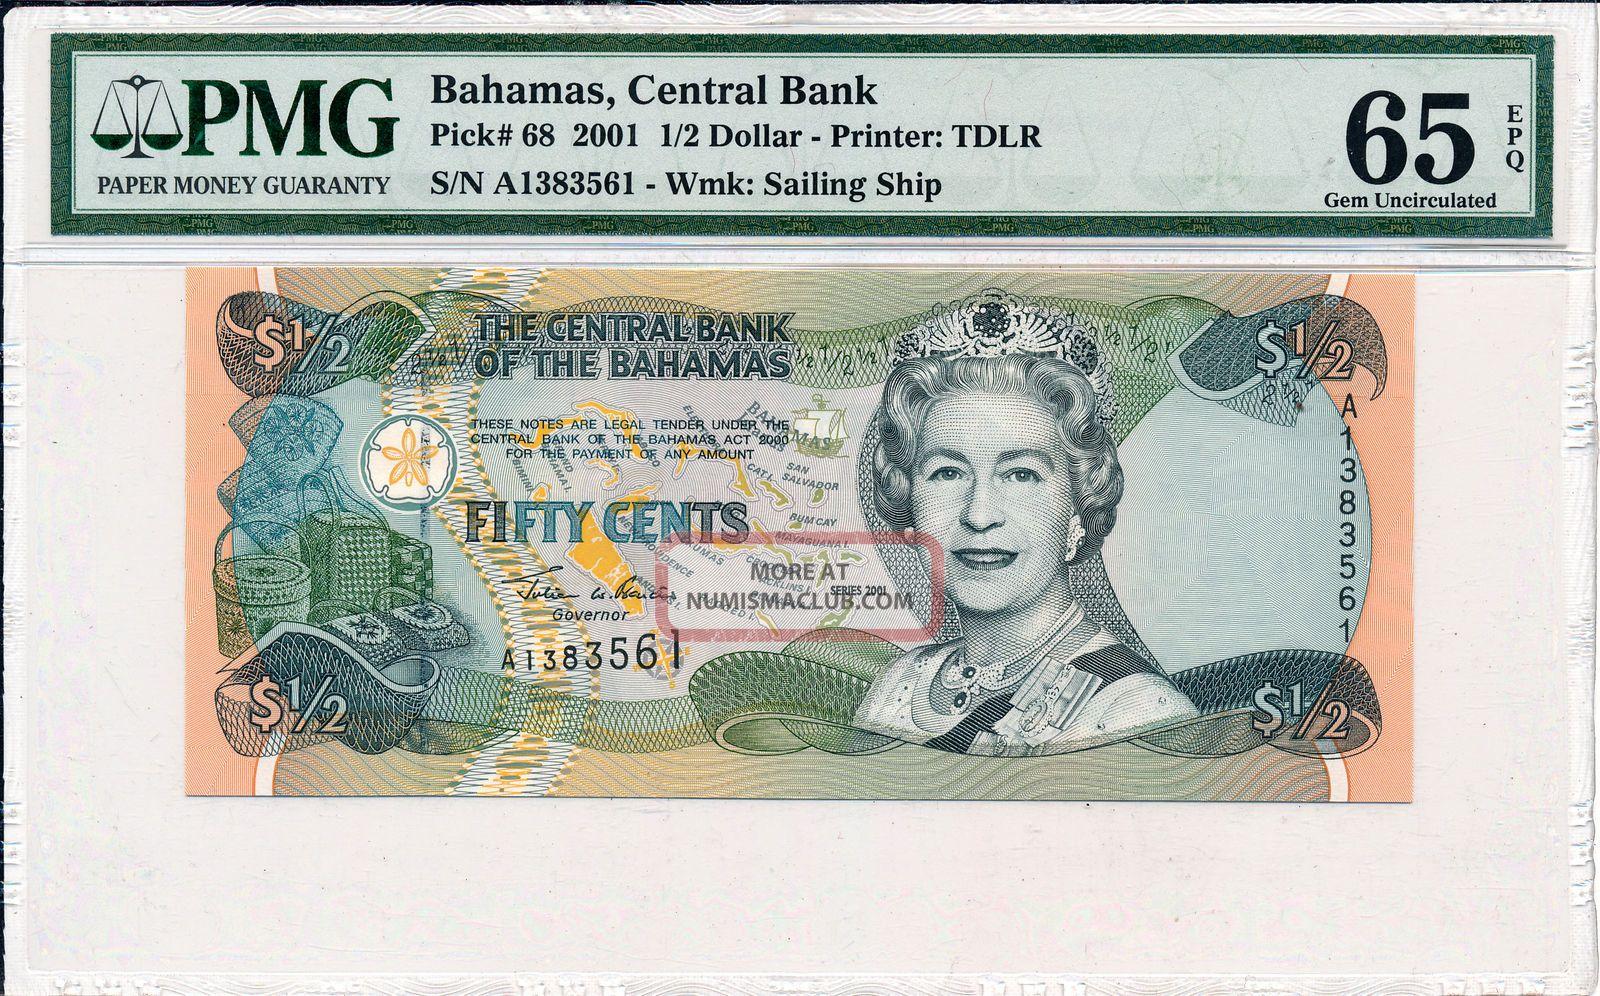 Central Bank Bahamas 1/2 Dollar 2001 Pmg 65epq North & Central America photo